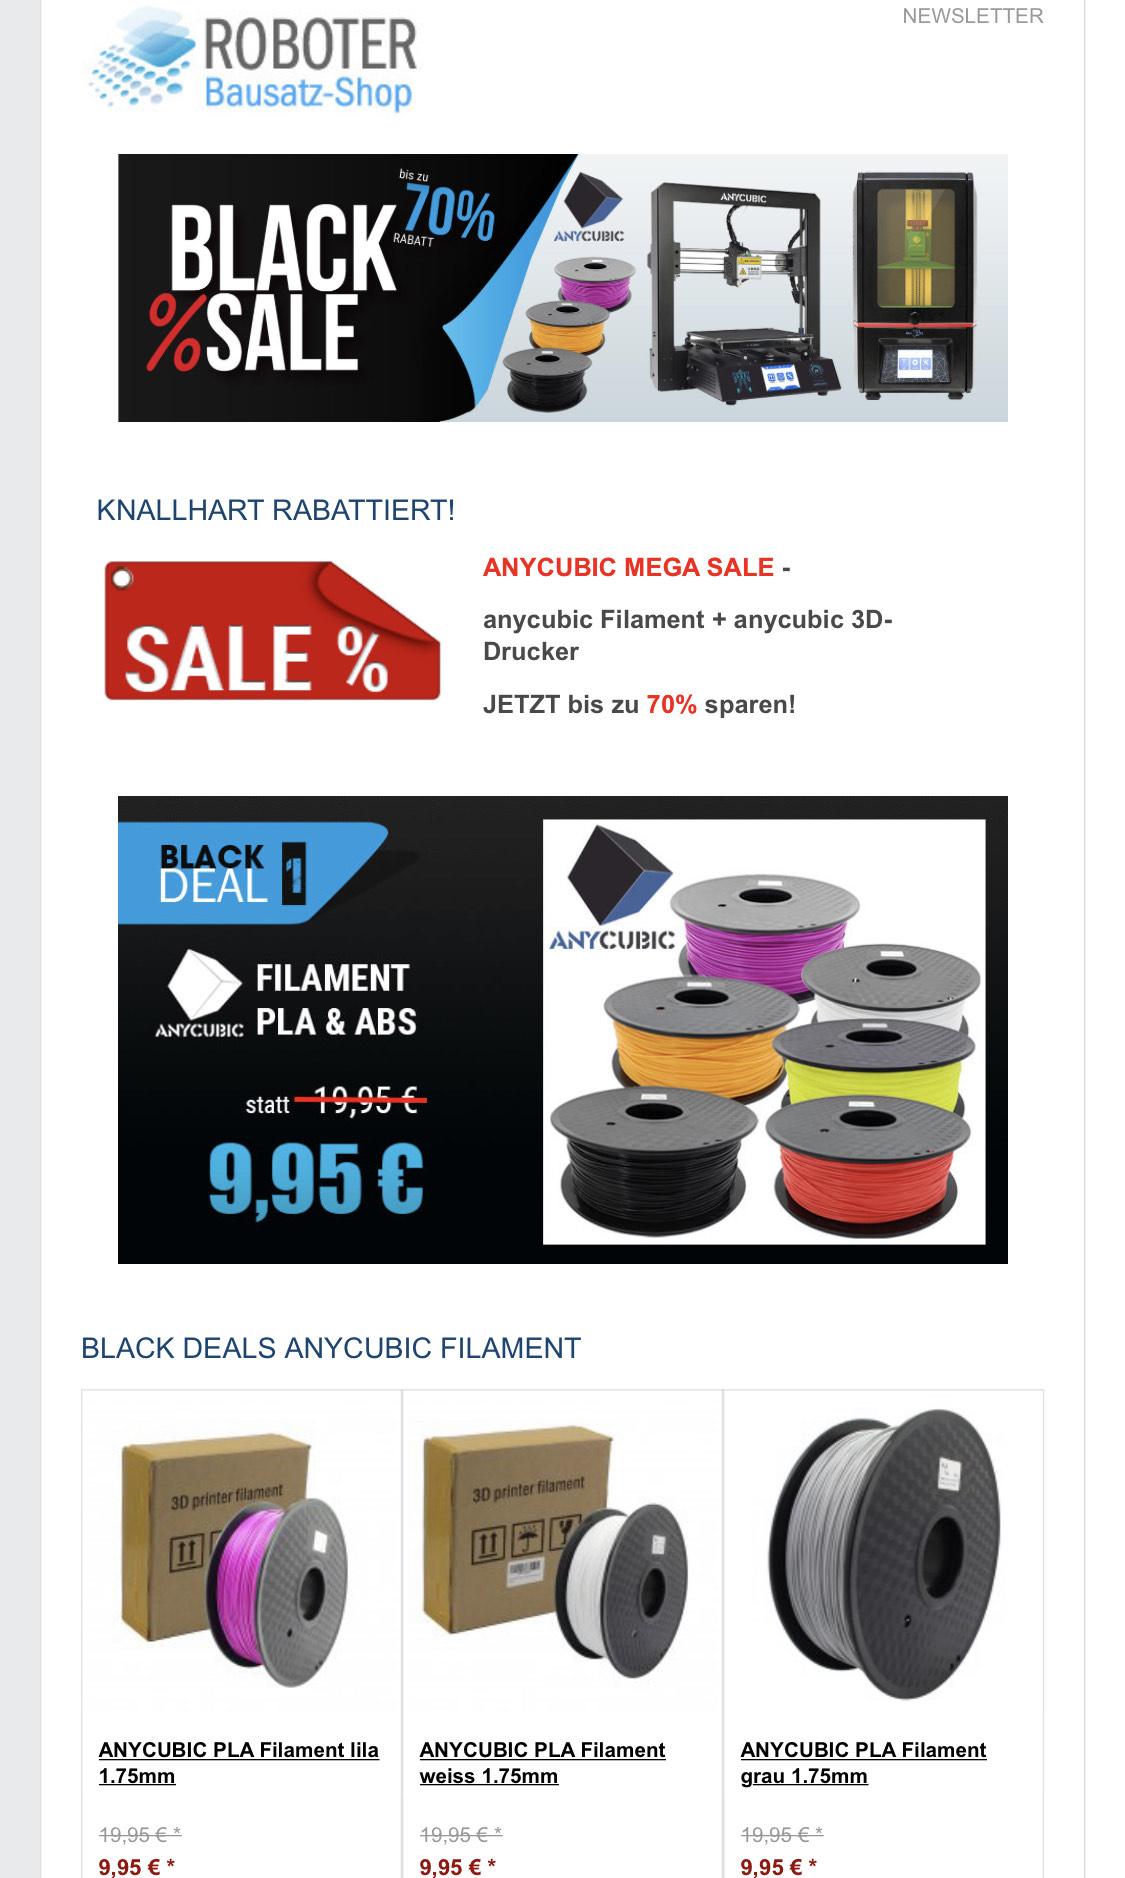 Roboter-Bausatz Shop - Anycubic Black Deal